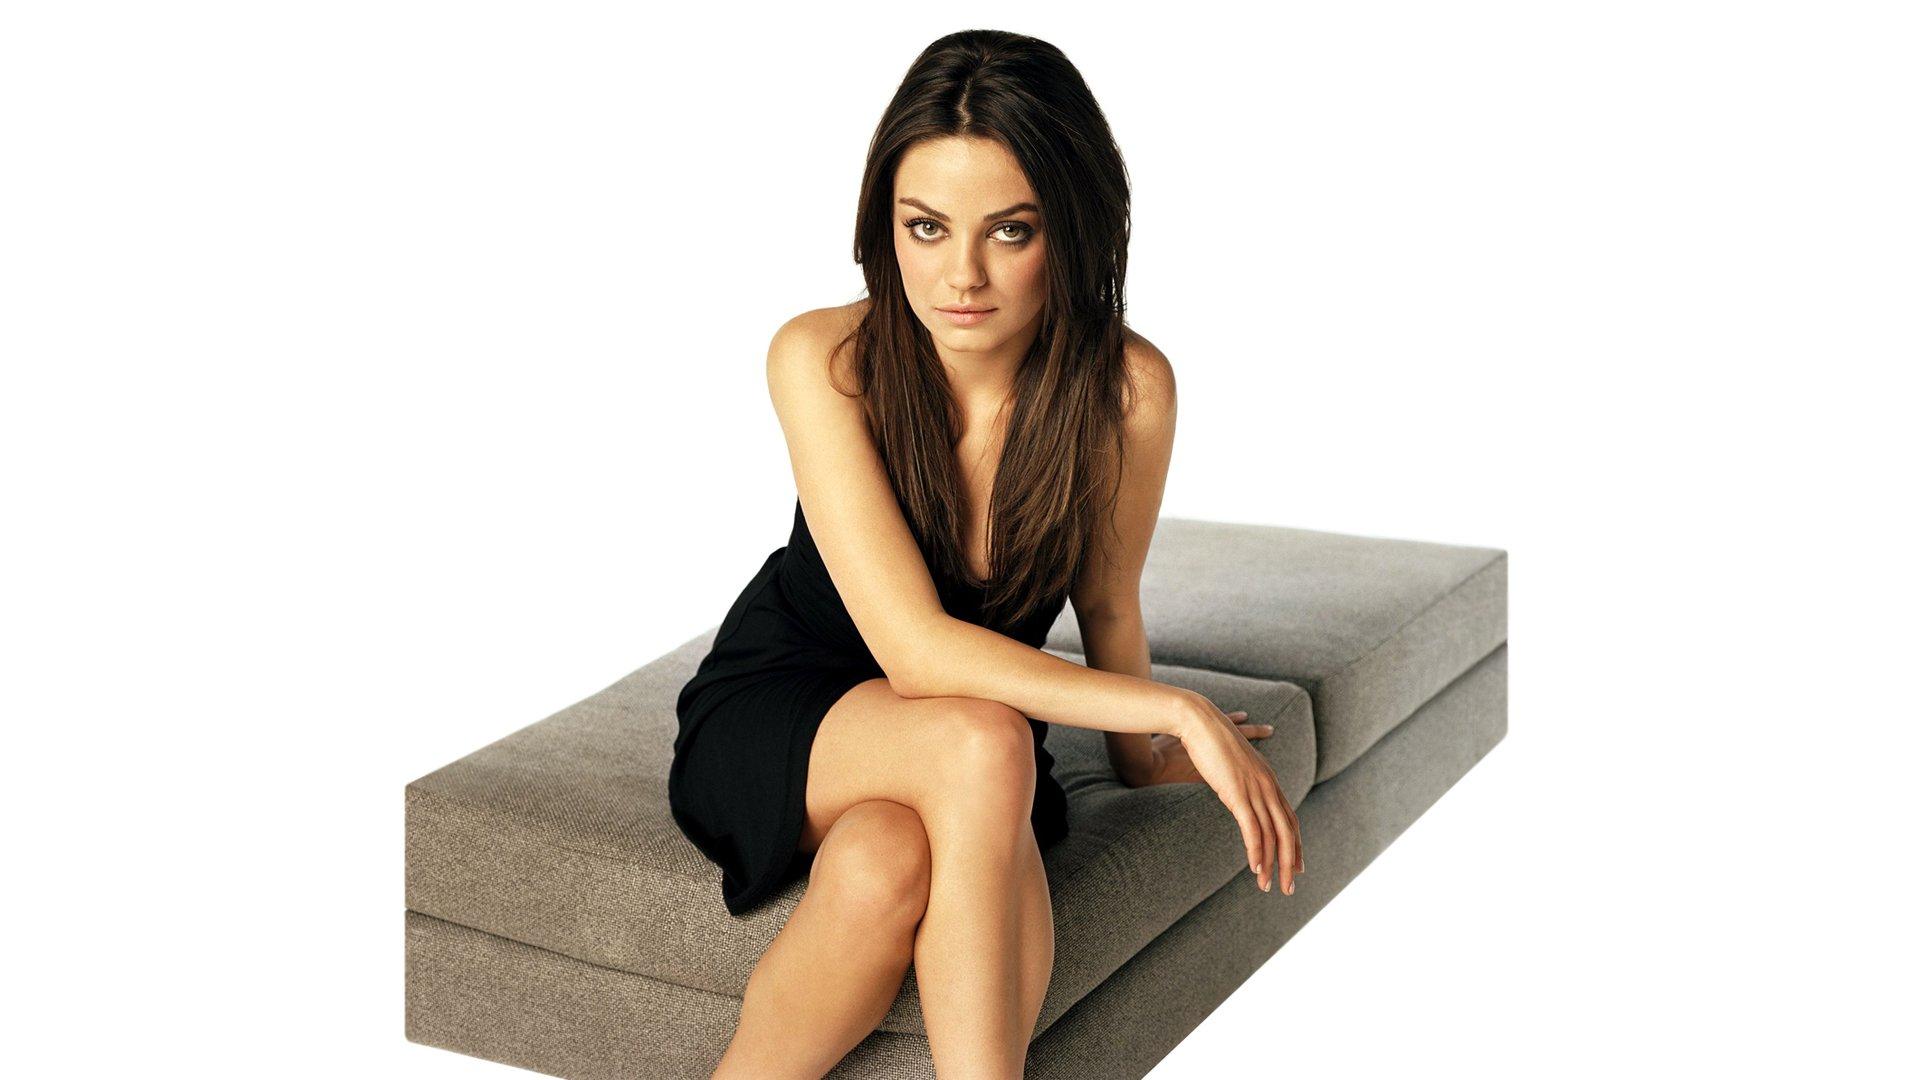 mila kunis full hd wallpaper and background 1920x1080 id 277367. Black Bedroom Furniture Sets. Home Design Ideas